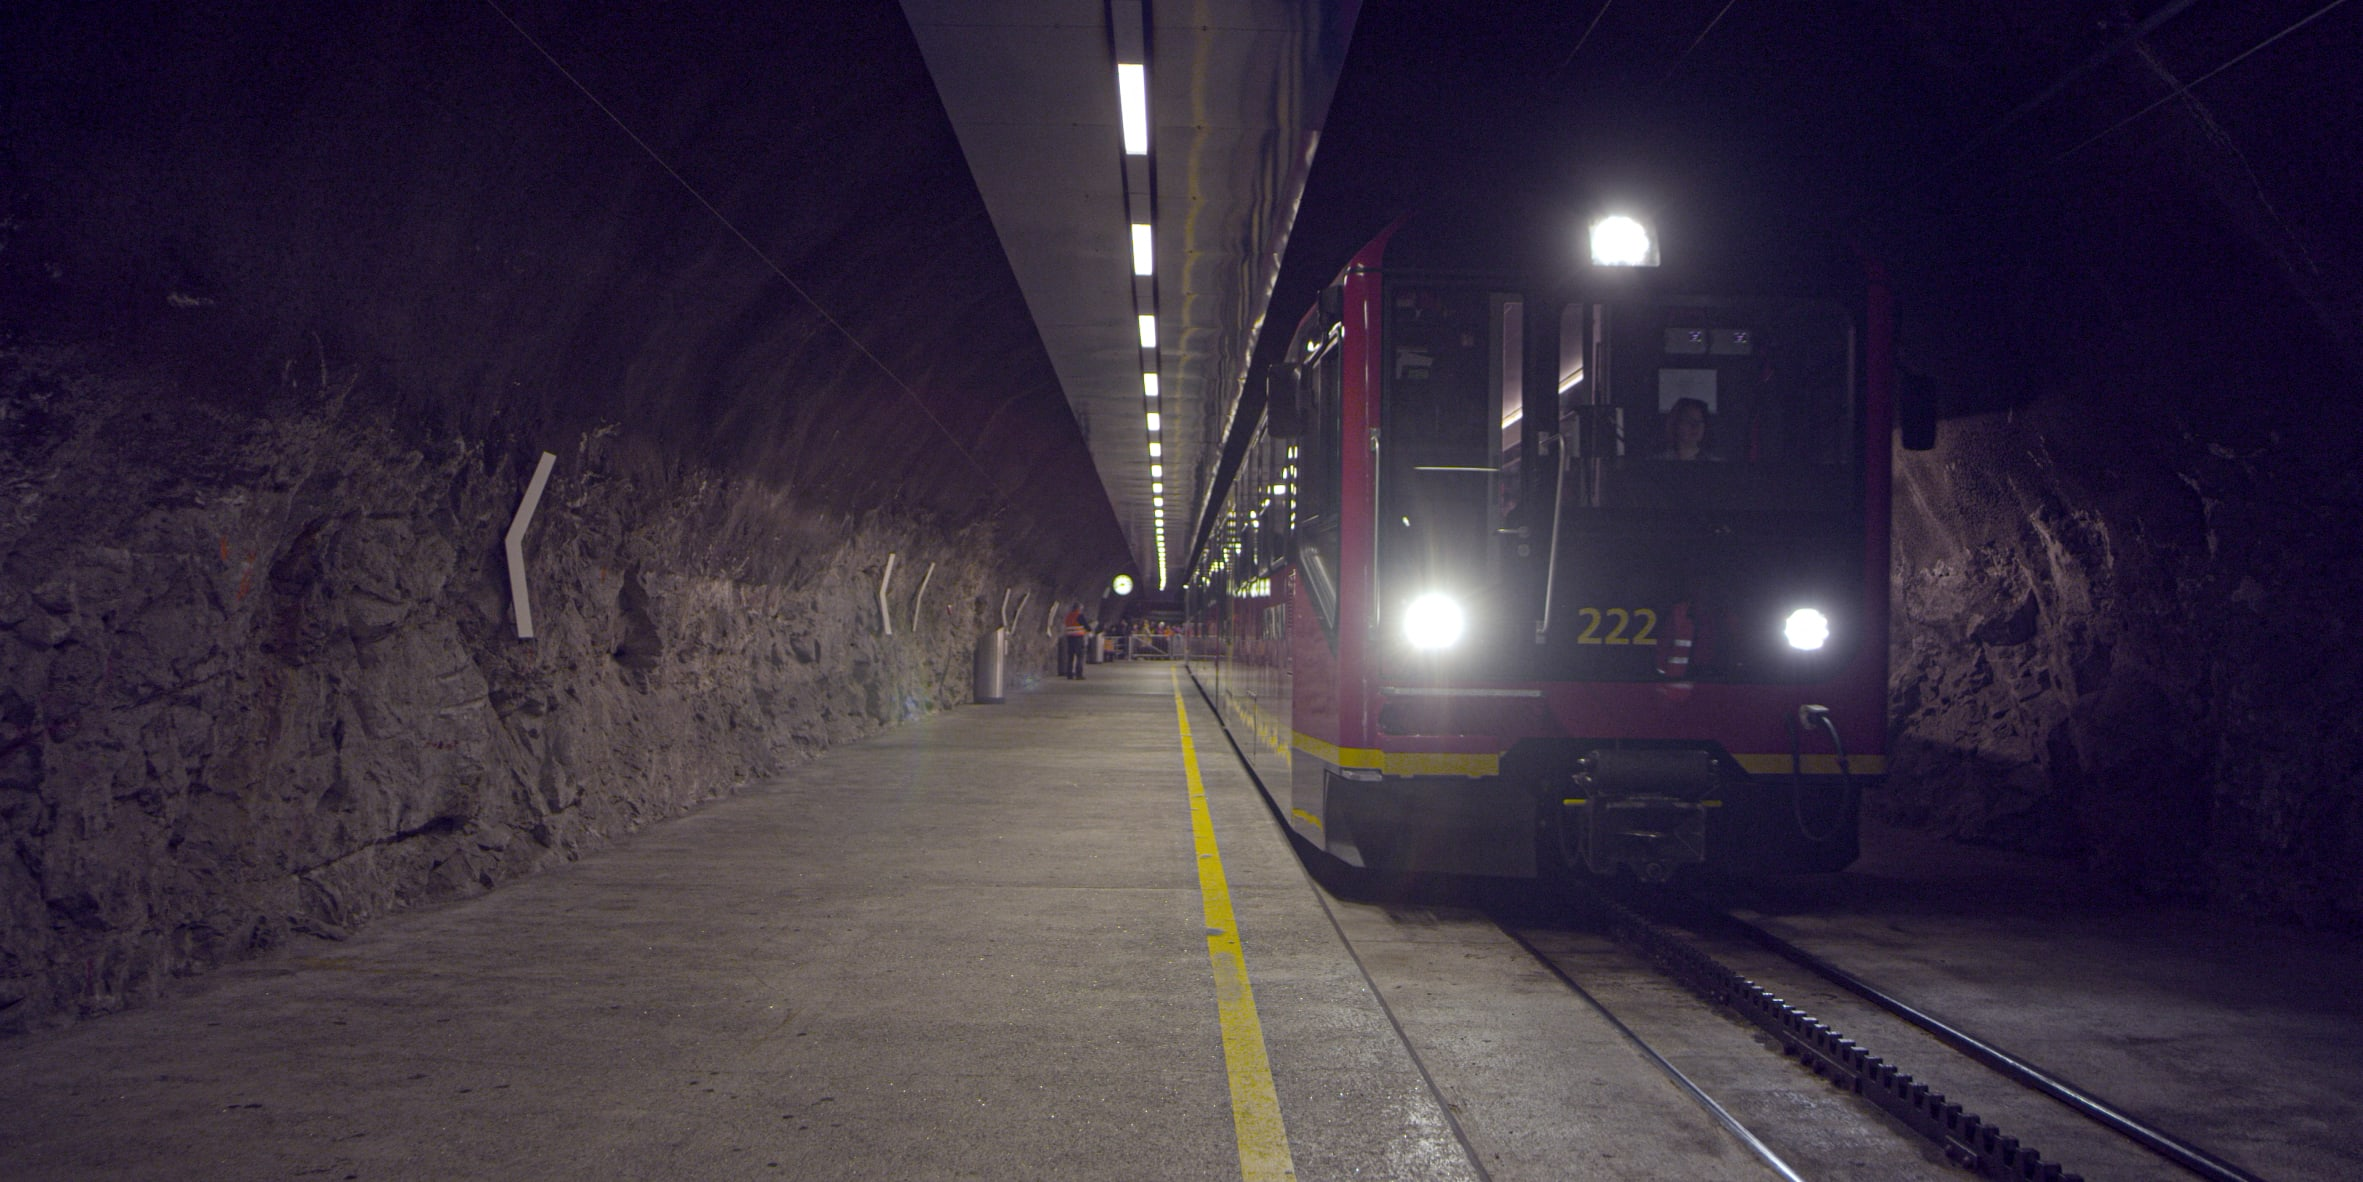 [Translate to English:] Bahnhof Jungfraujoch Top Of Europe